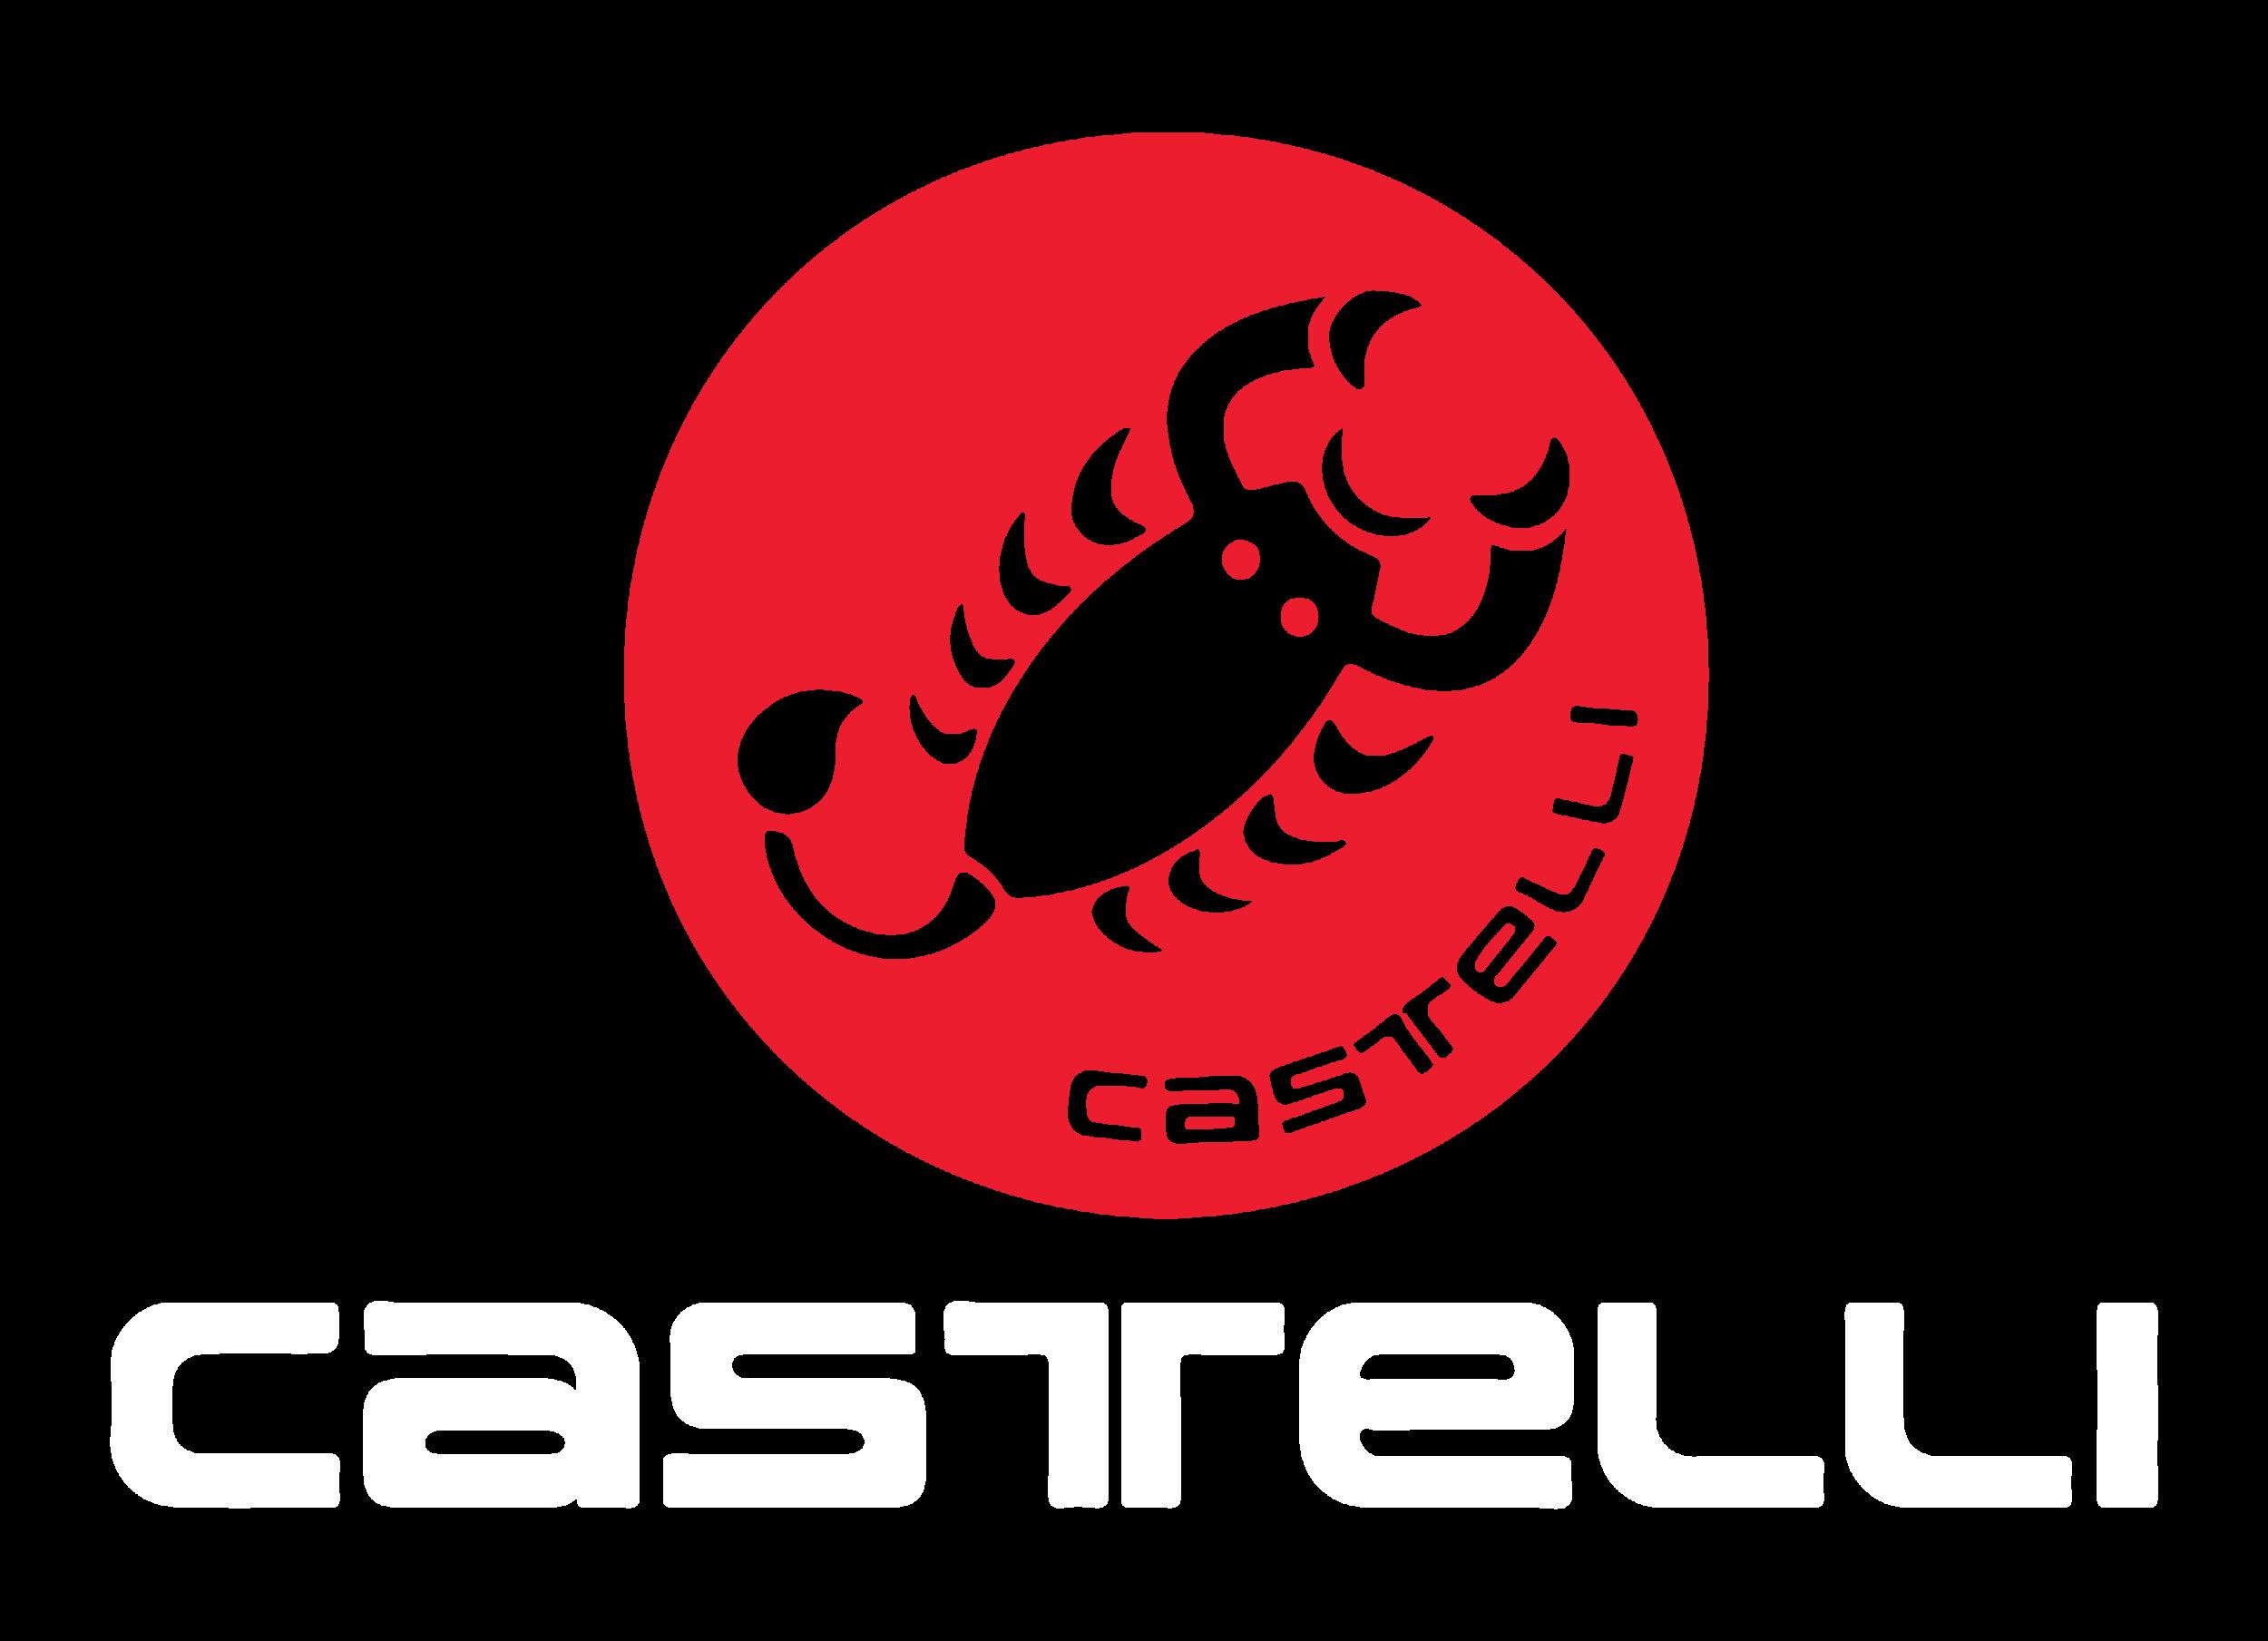 2019 Sponsors_Castelli.png